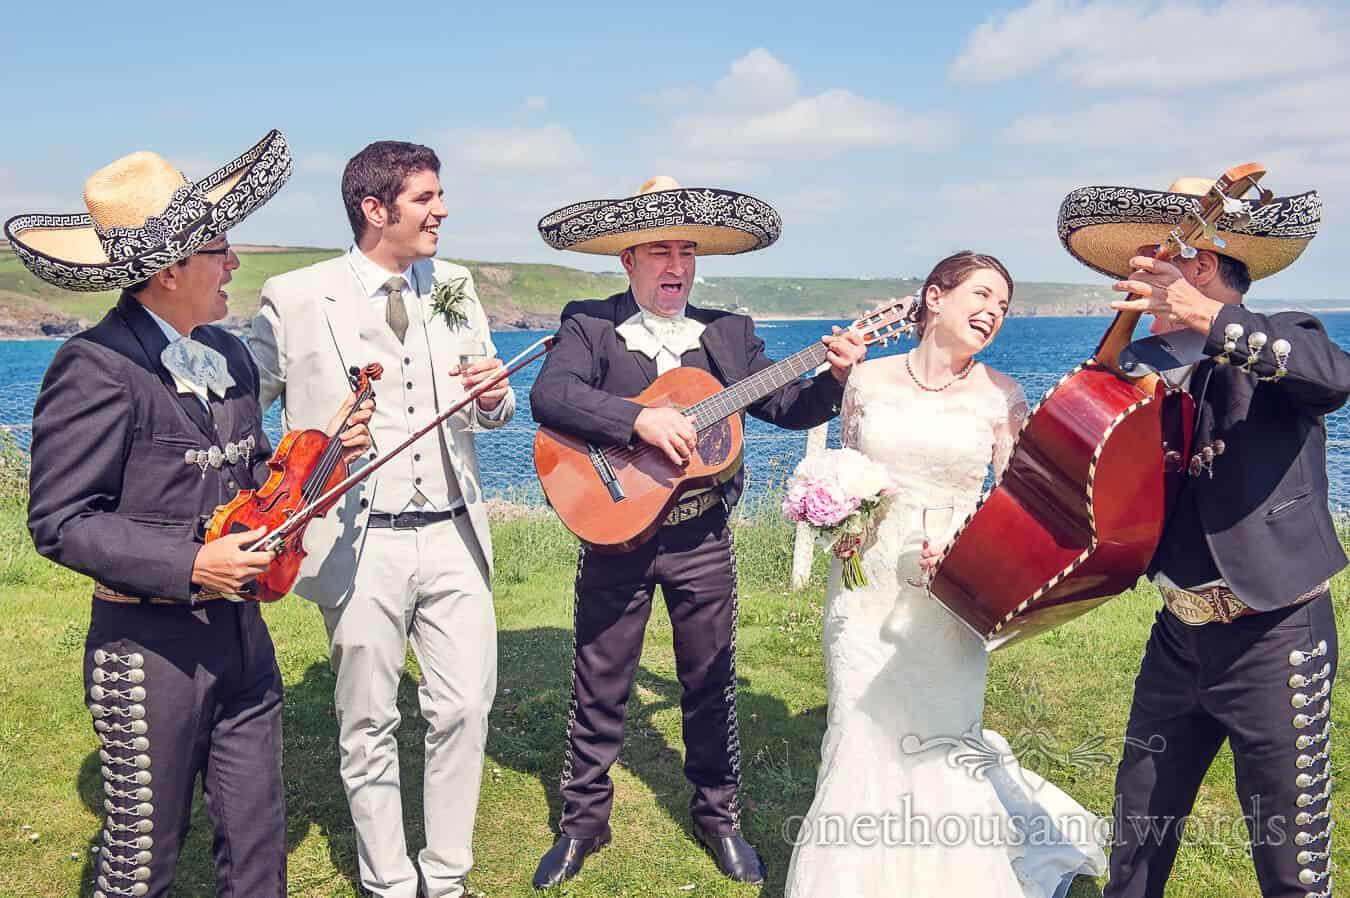 Wedding mariachi band at Prussia Cove wedding venue in Cornwall